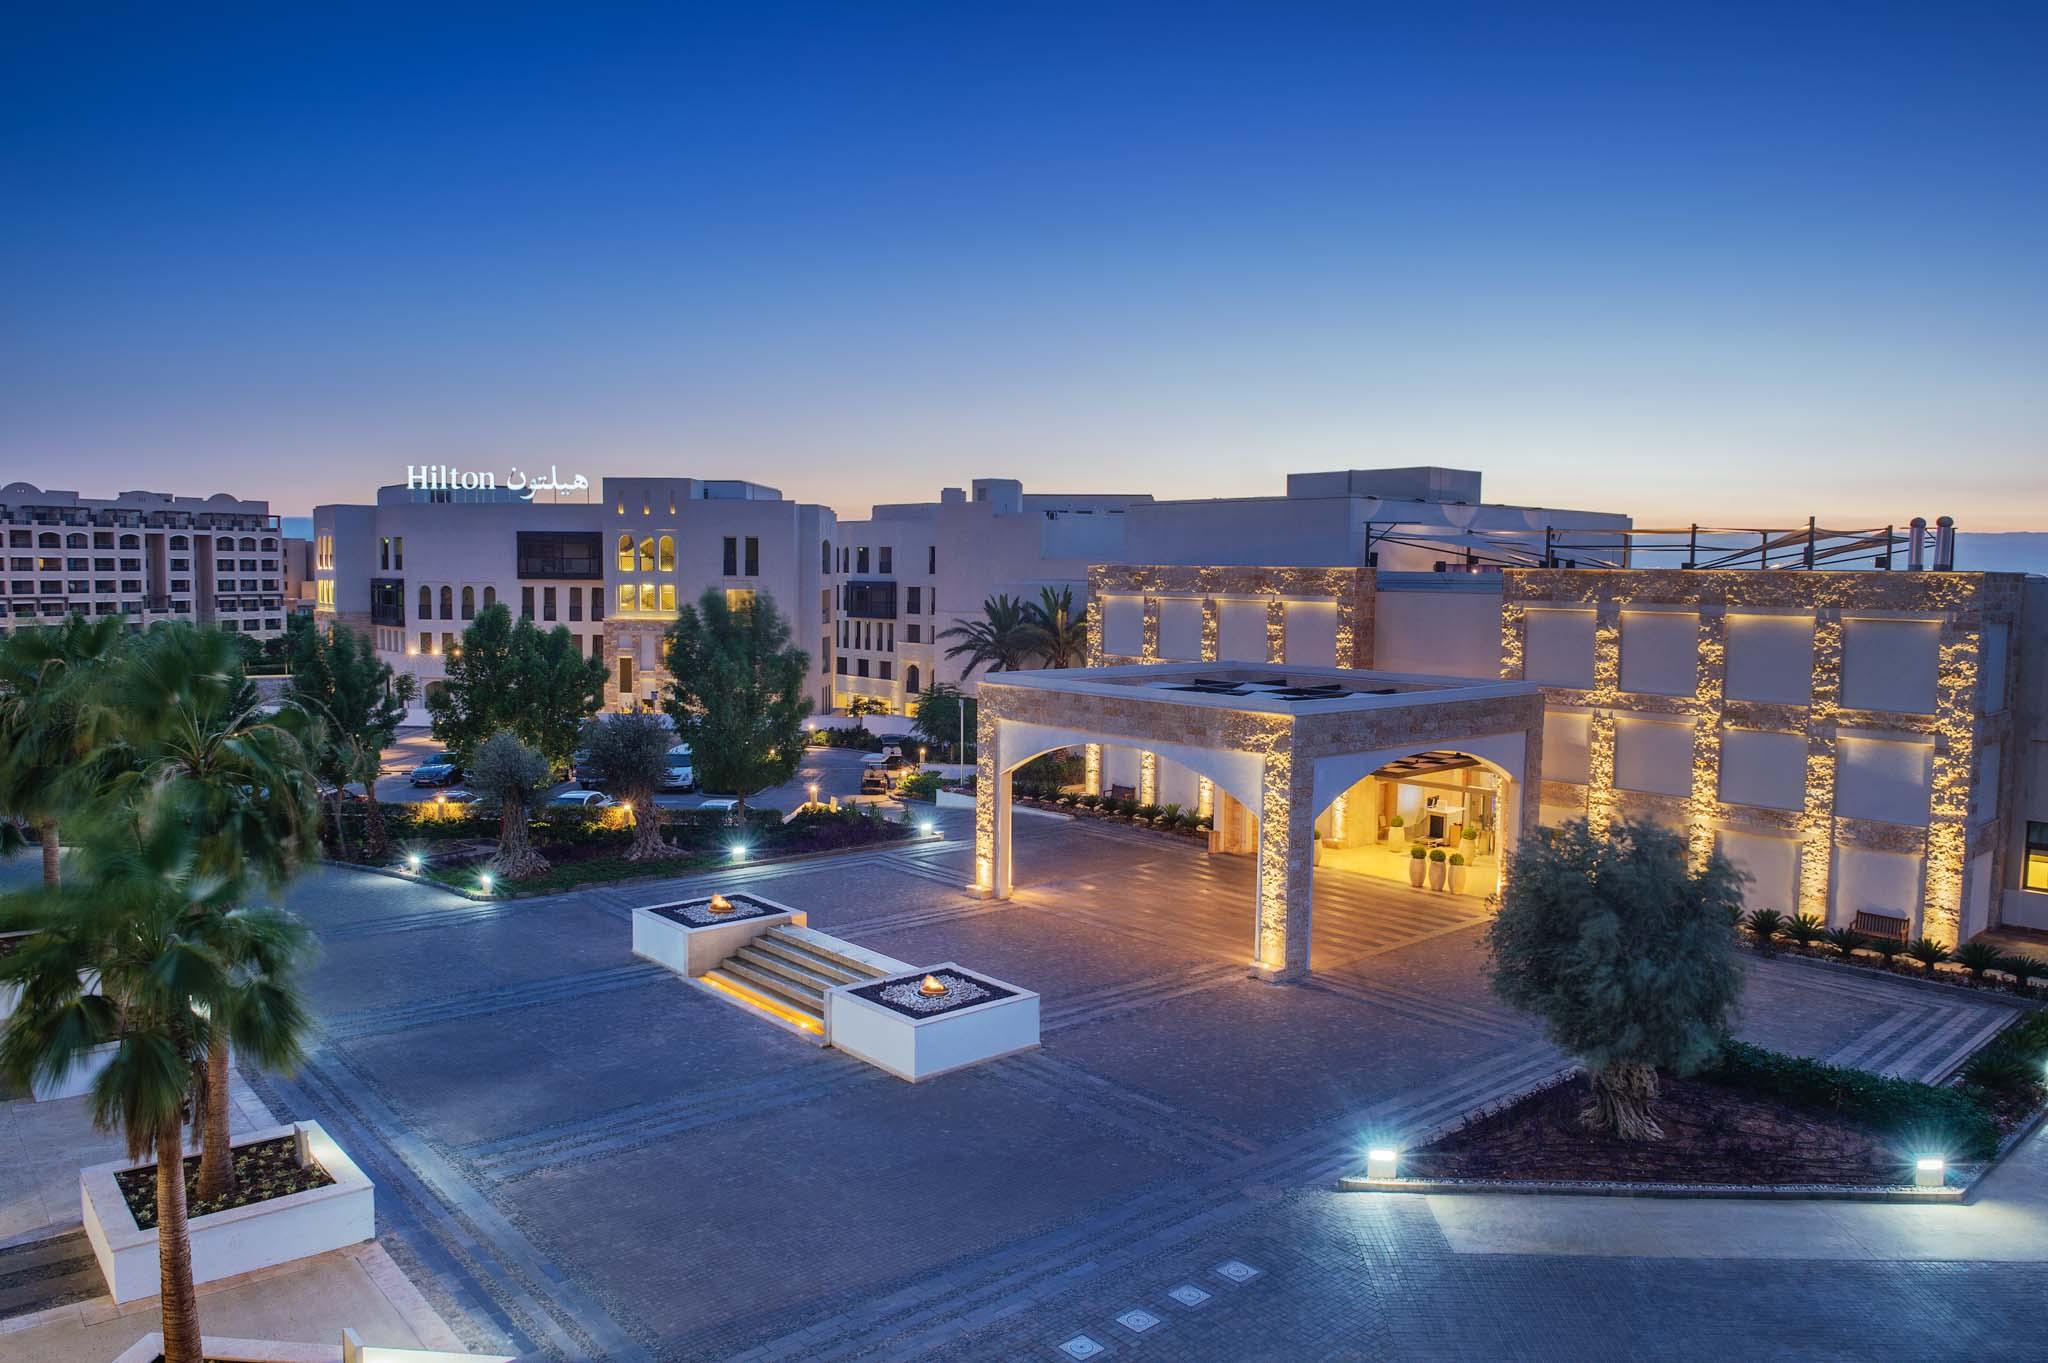 Hotel Photographer - Hilton Dead Sea Exterior